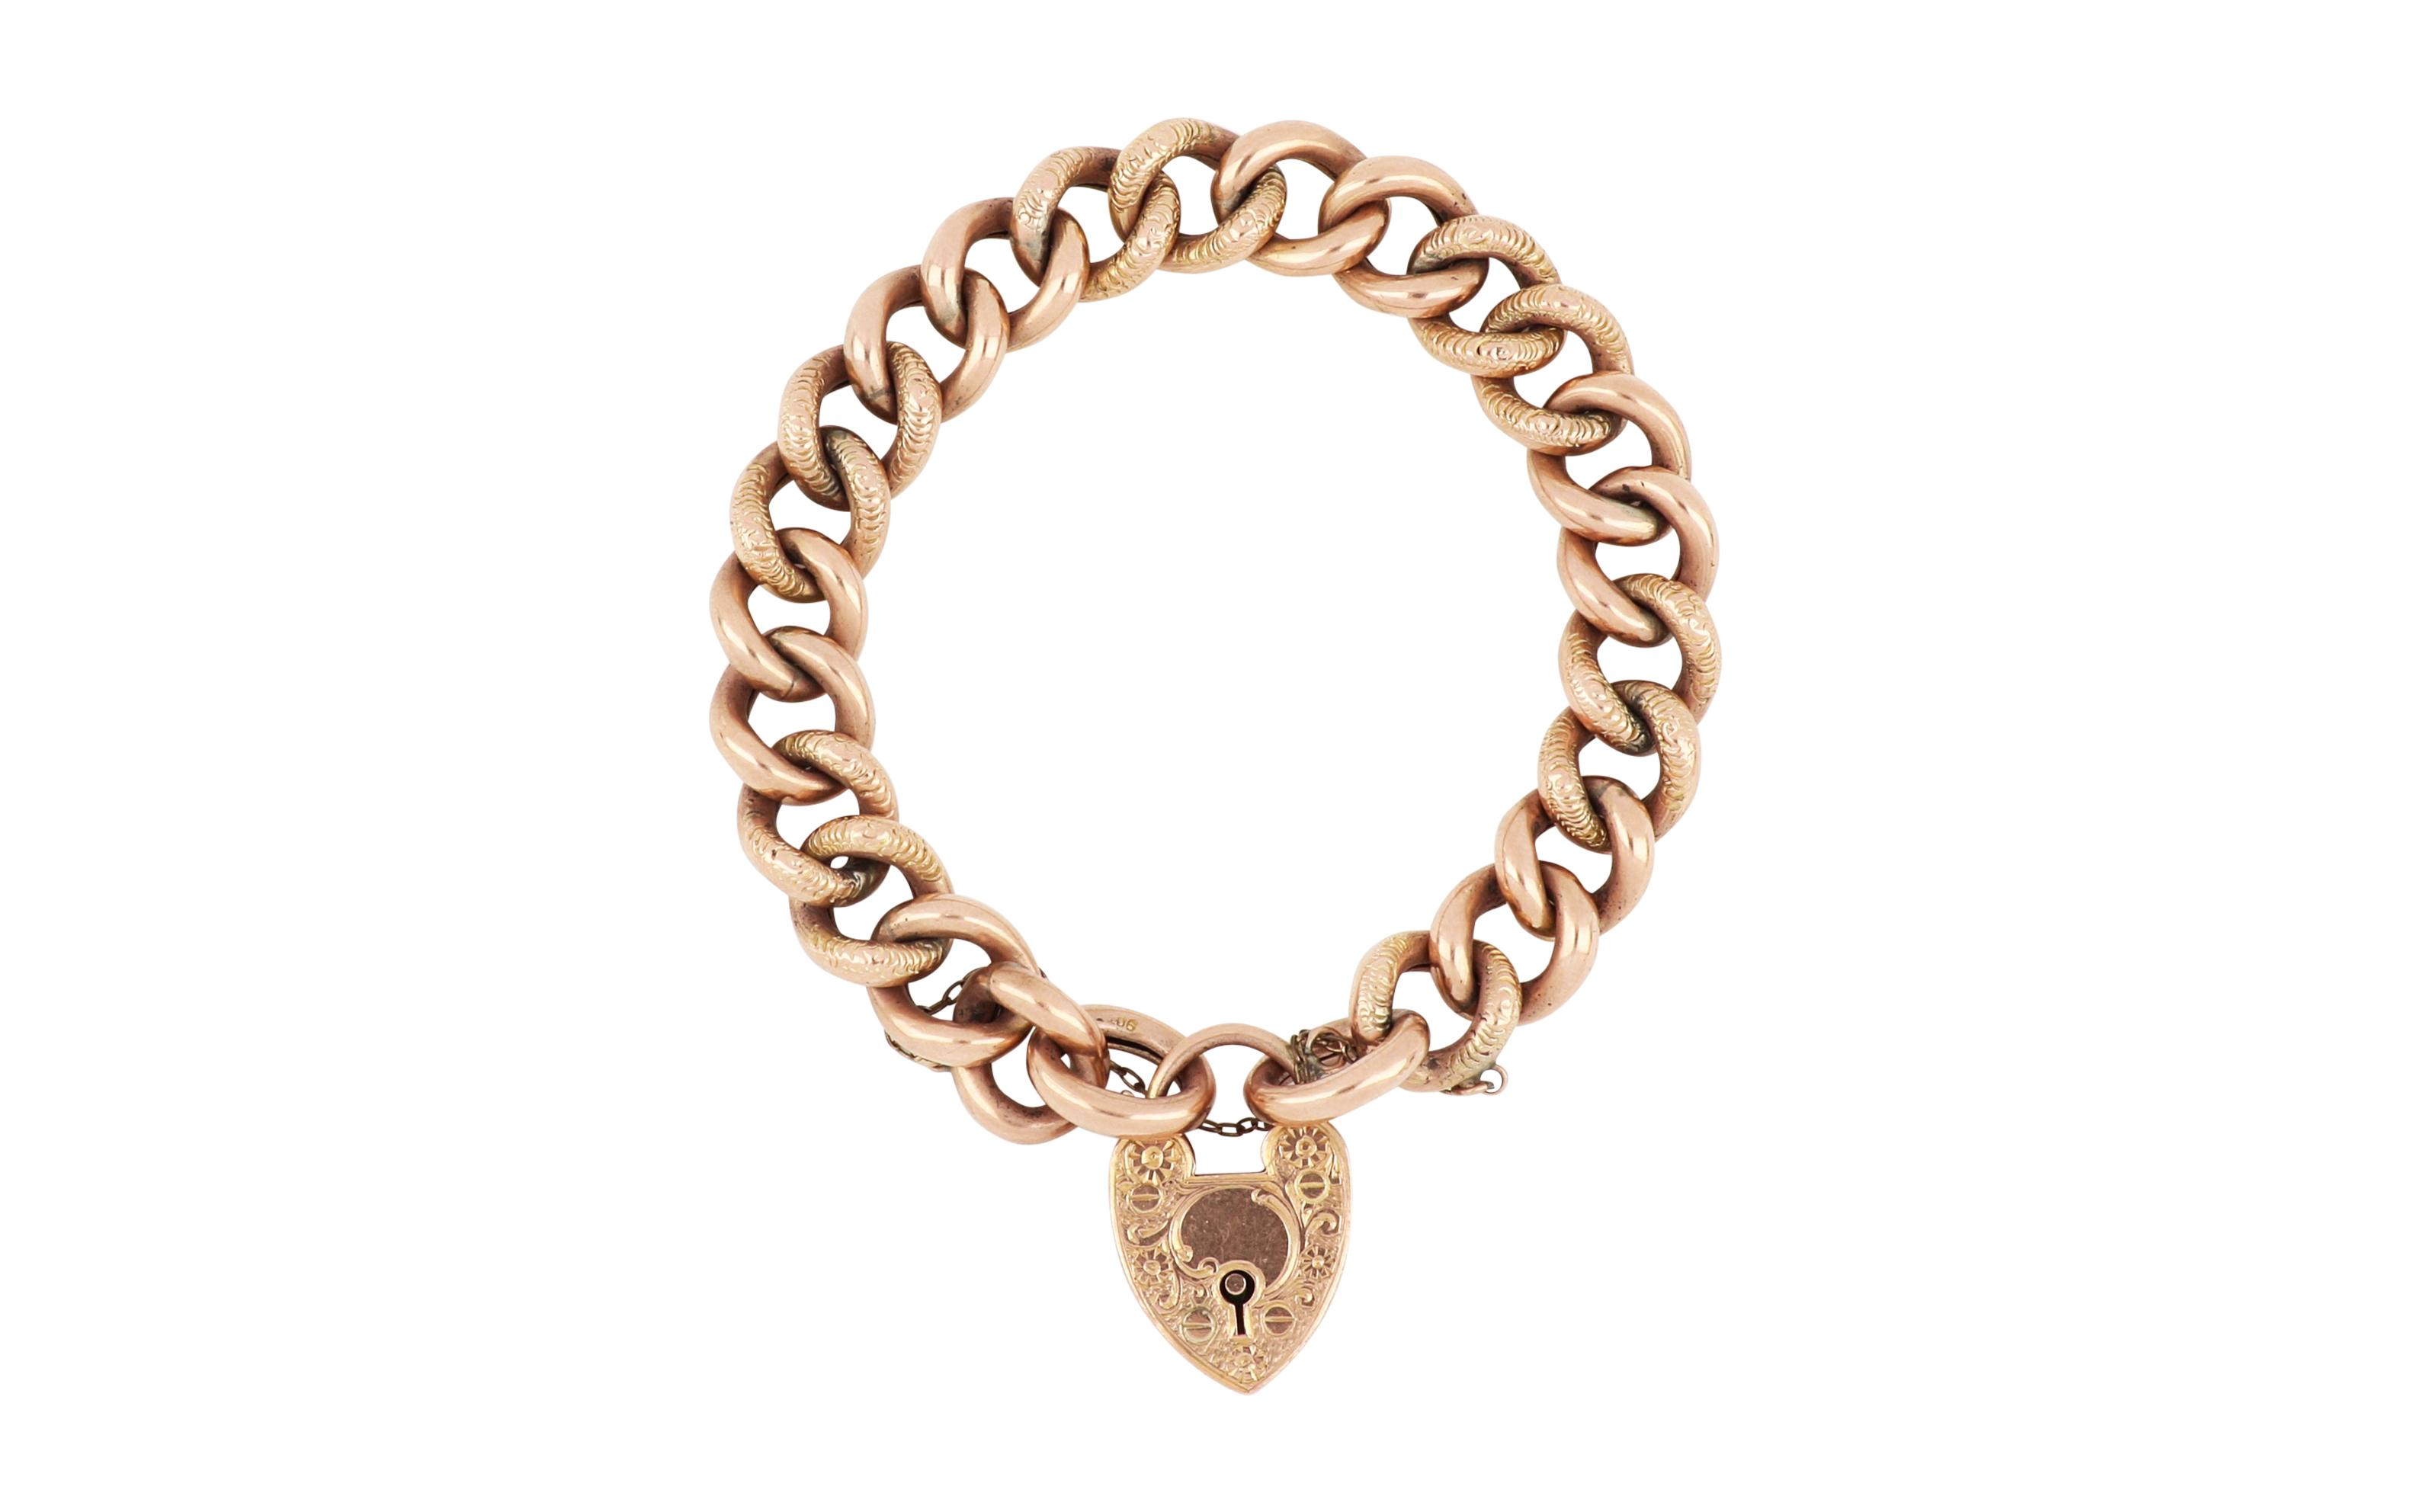 Antique 9ct rose gold night & day bracelet